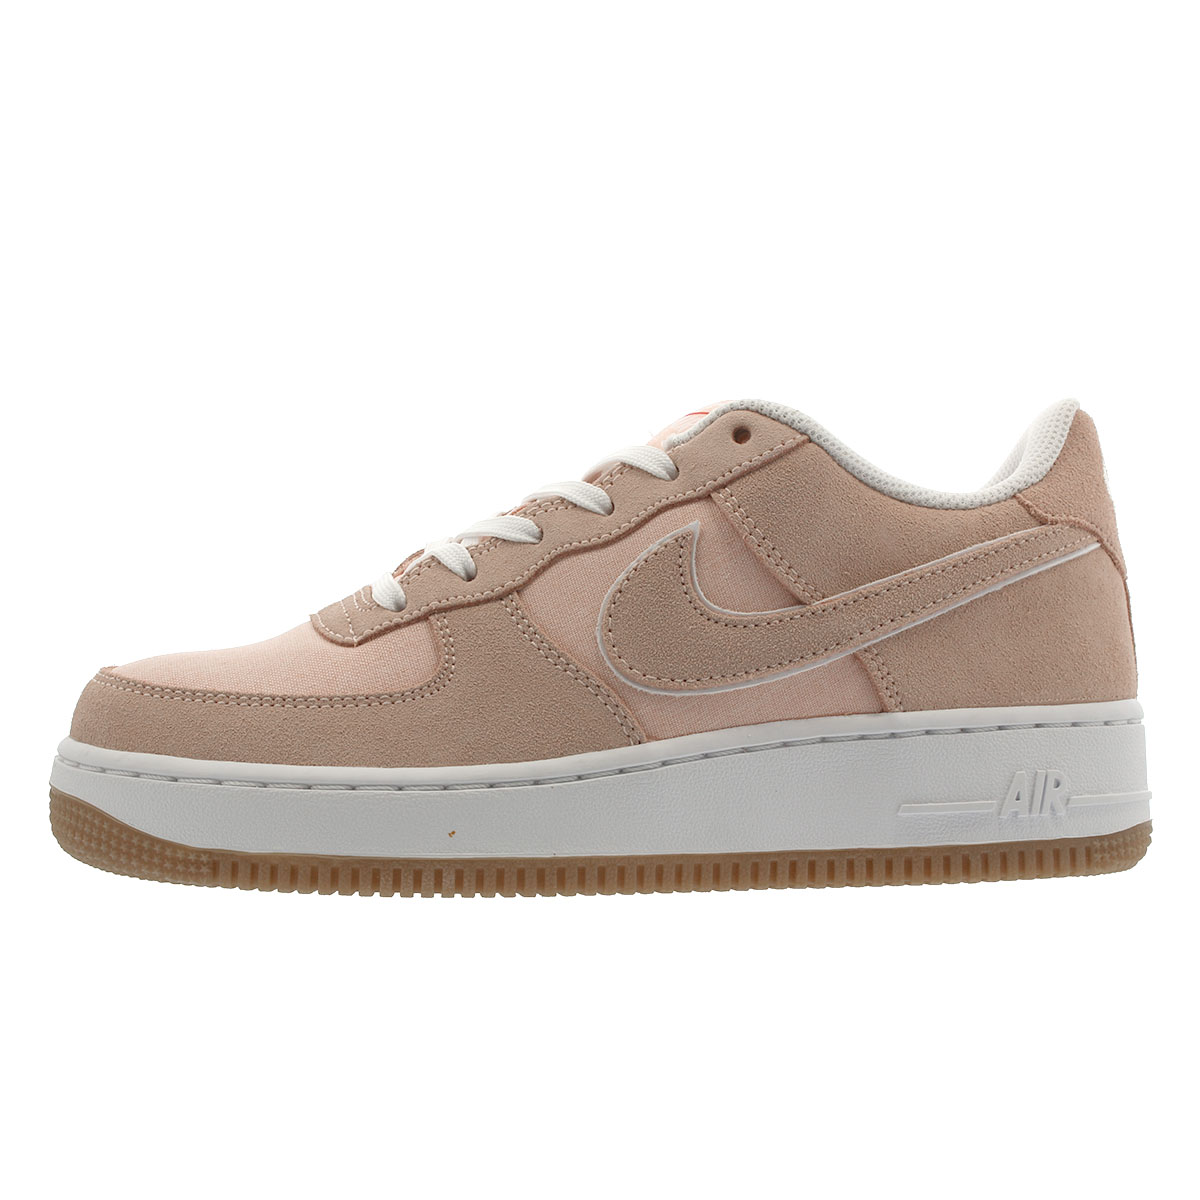 596 728 Gs Air 1 Orangeartic Nike Force Artic Orange 800 vn0wNm8OyP